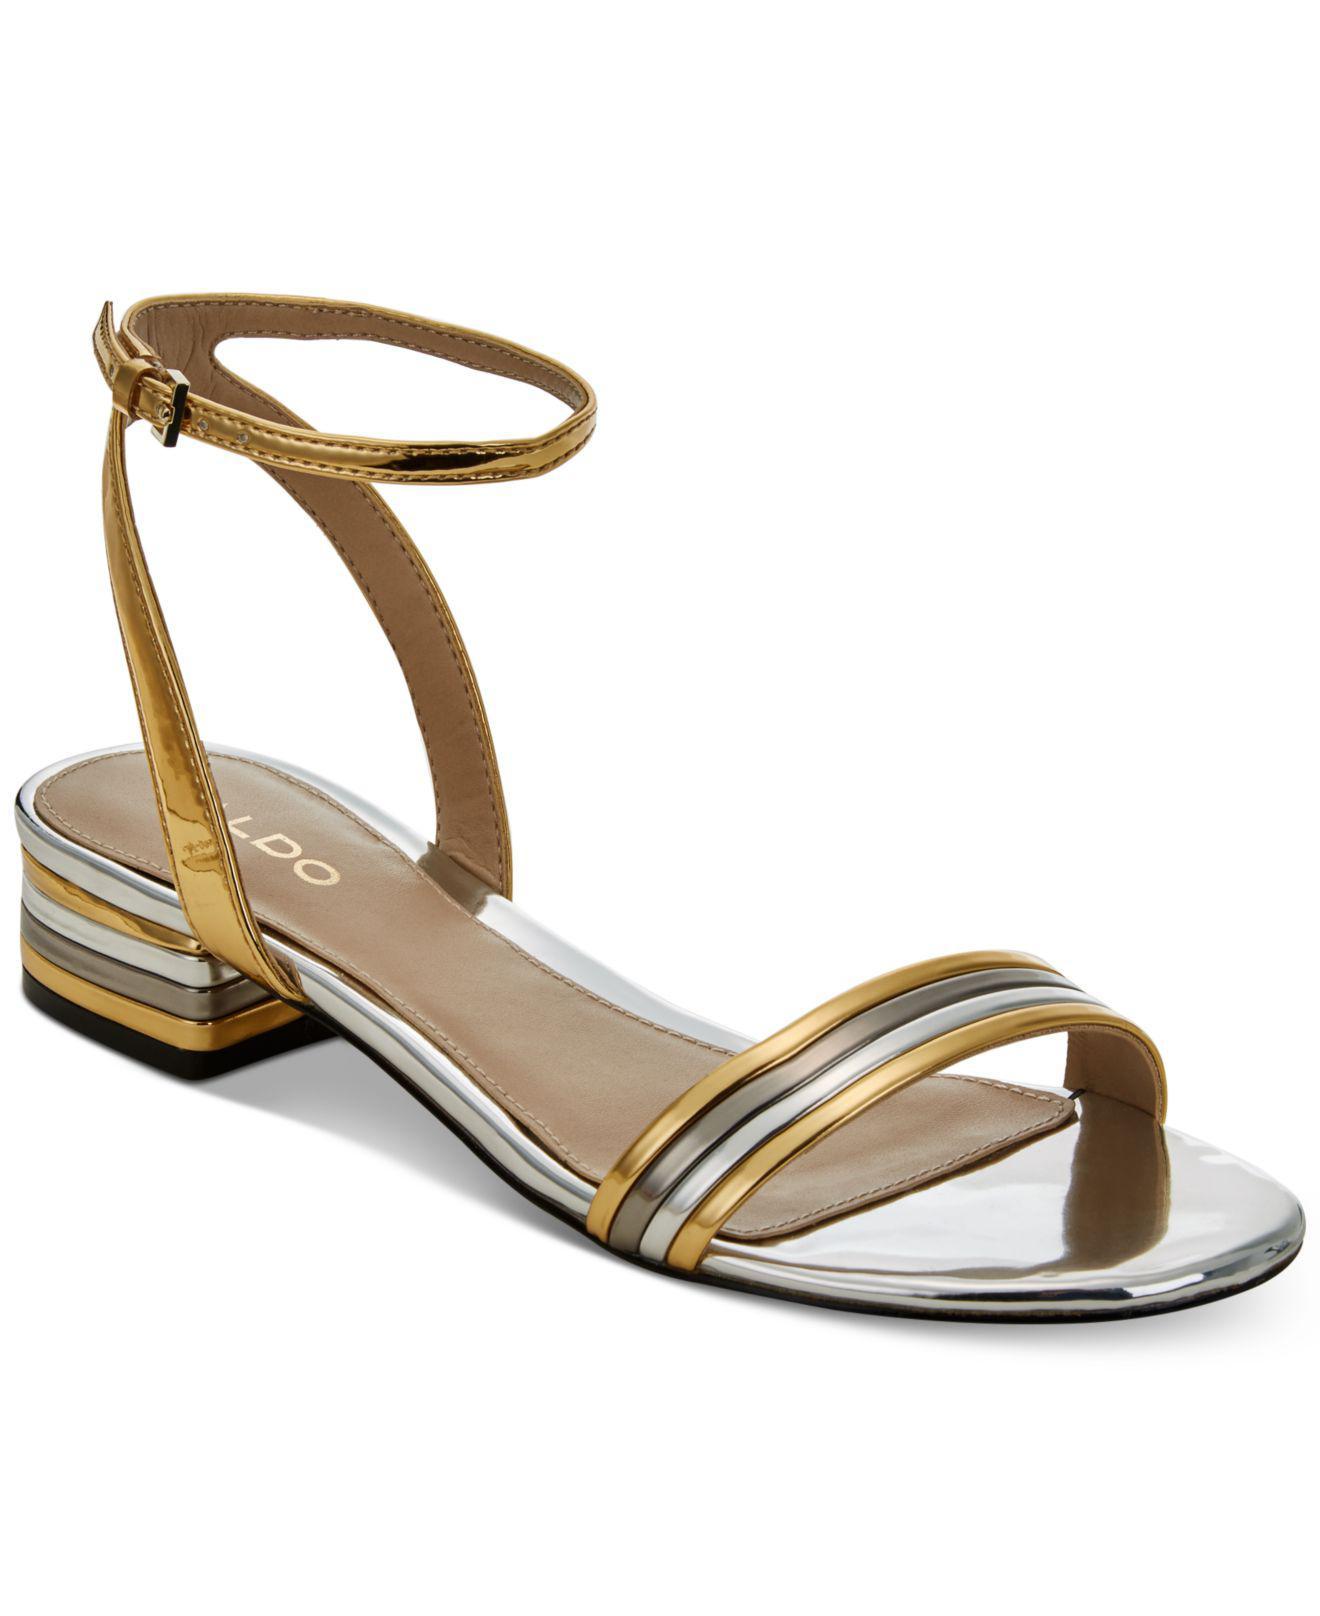 8e77c2f8079 Lyst - ALDO Izzie Metallic Sandals in Metallic